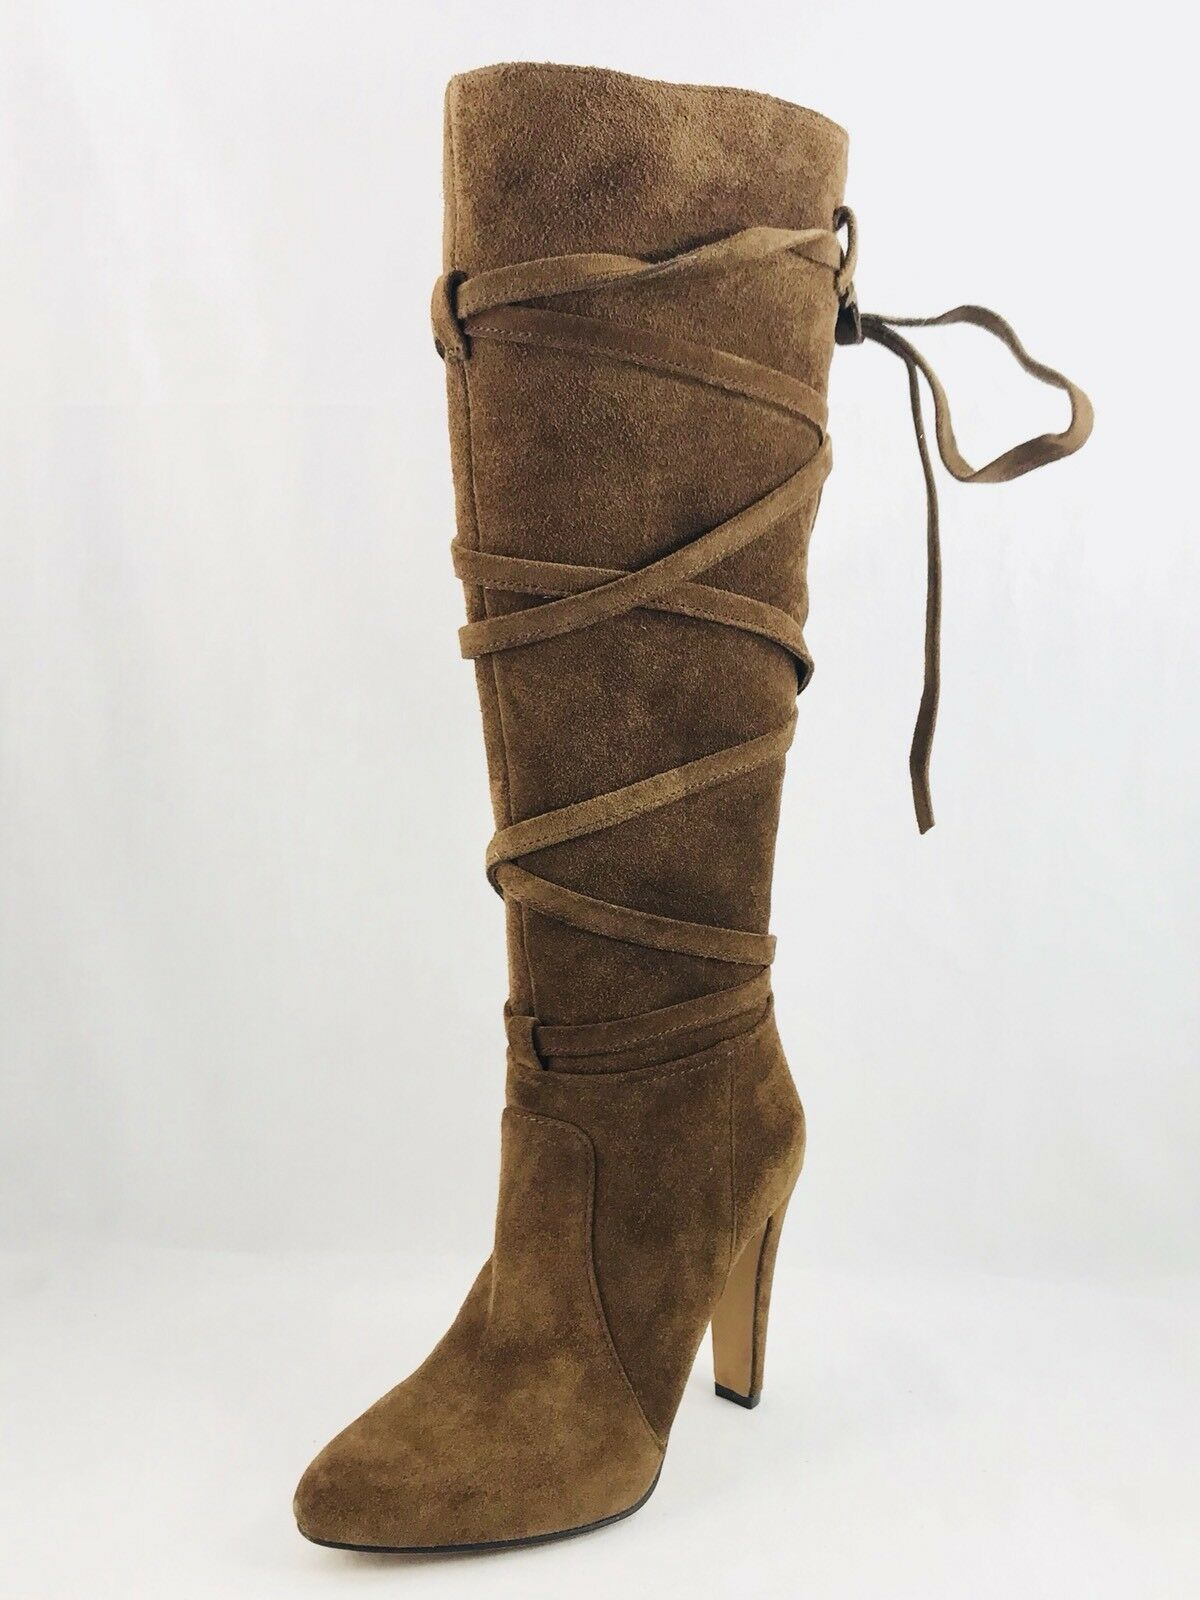 Vince Camuto Millay Damens Round Toe Suede Braun 6.5 Knee High Boot Größe 6.5 Braun fa7e36